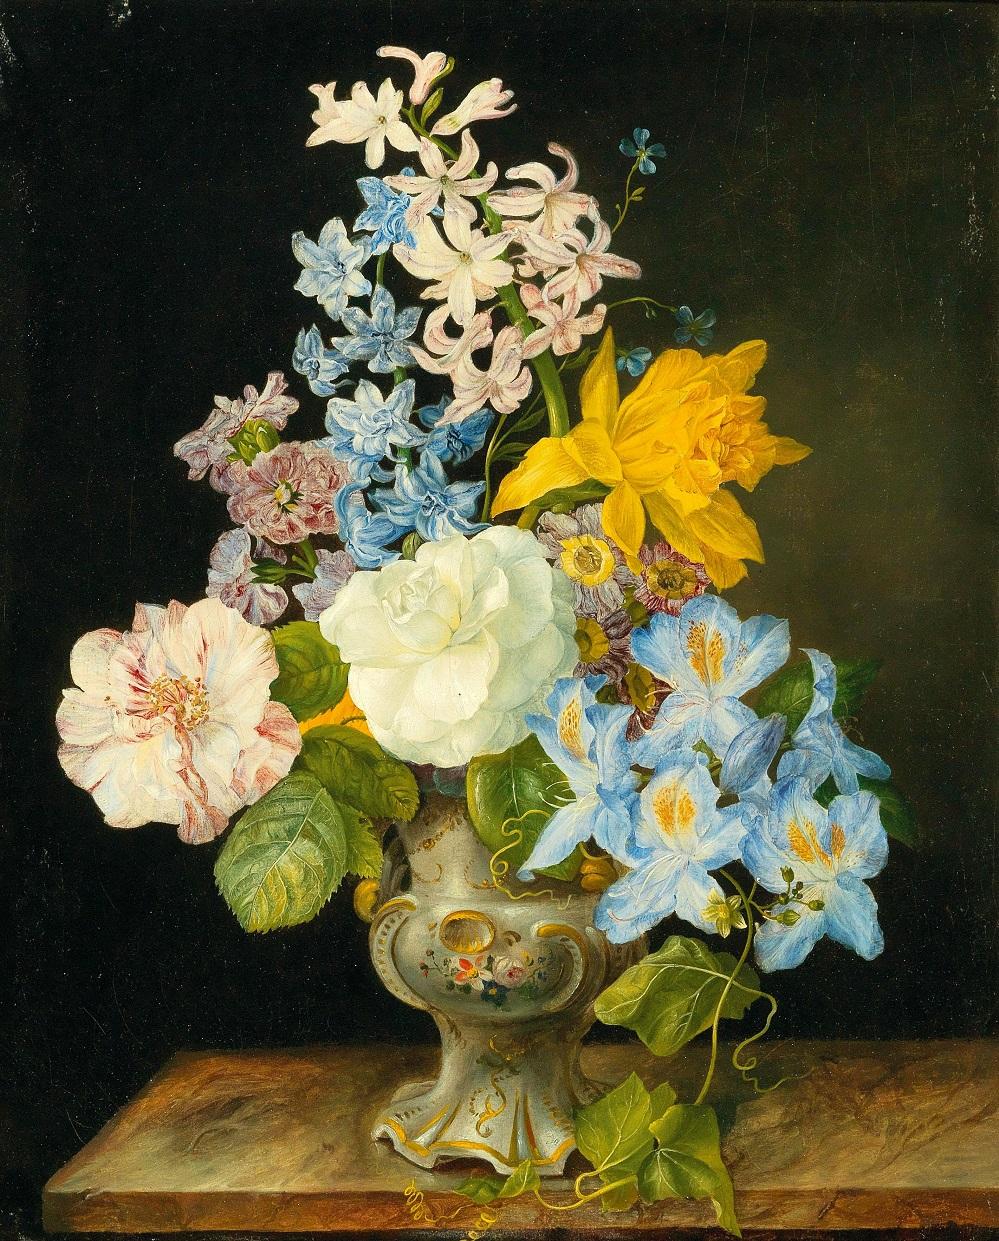 Franz-Xaver-Petter-attributed.jpg